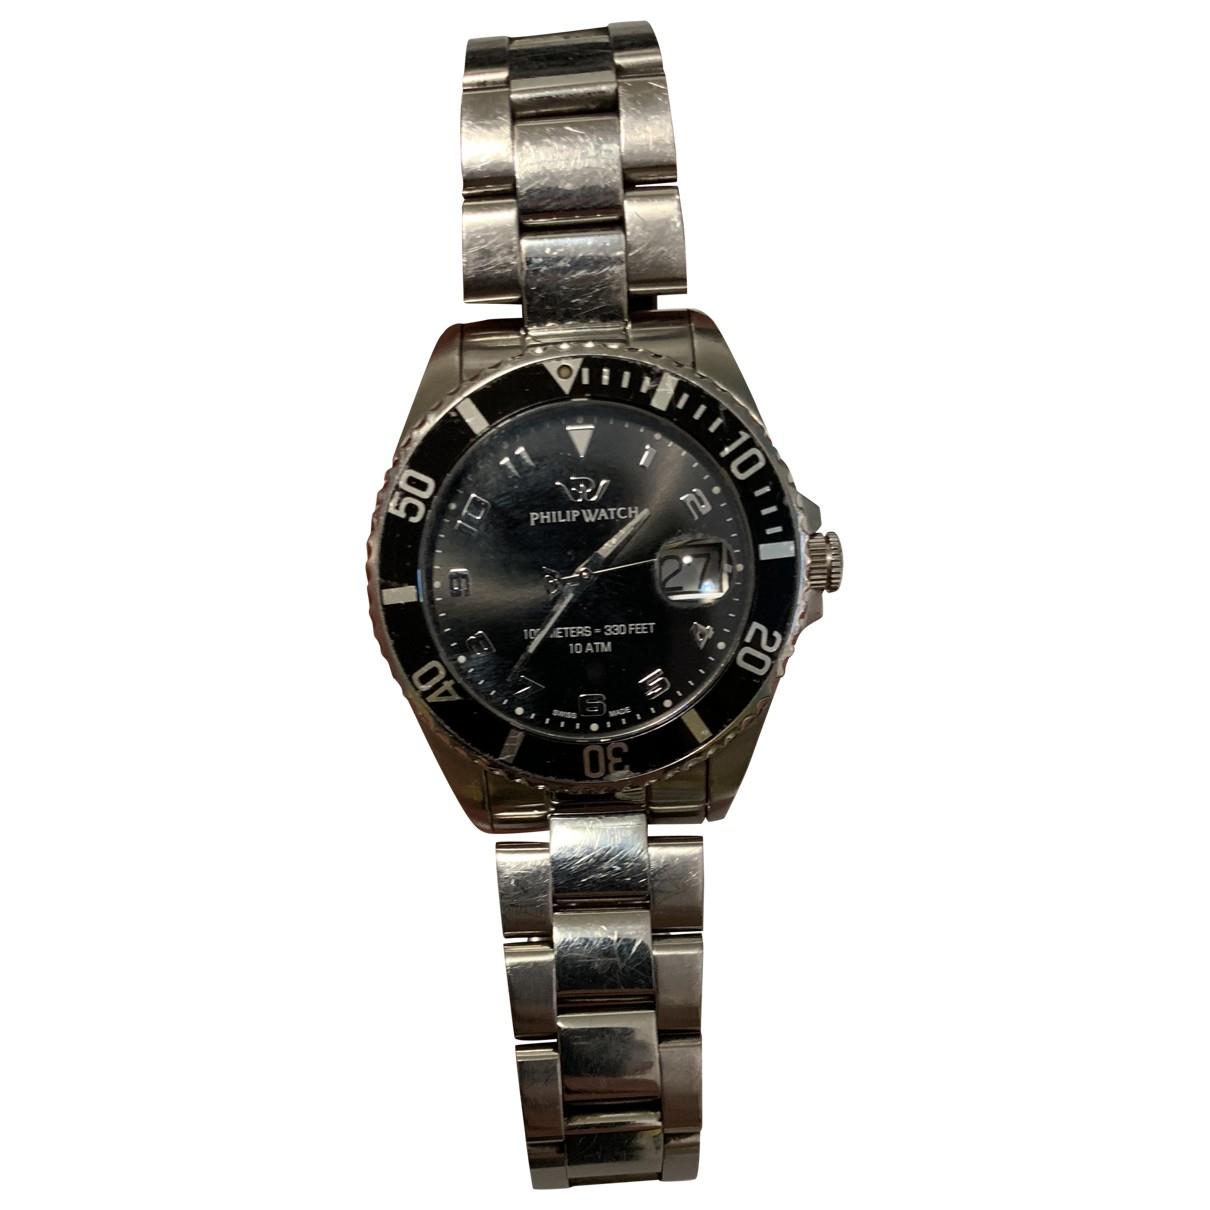 Philippe Watch \N Silver Steel watch for Men \N